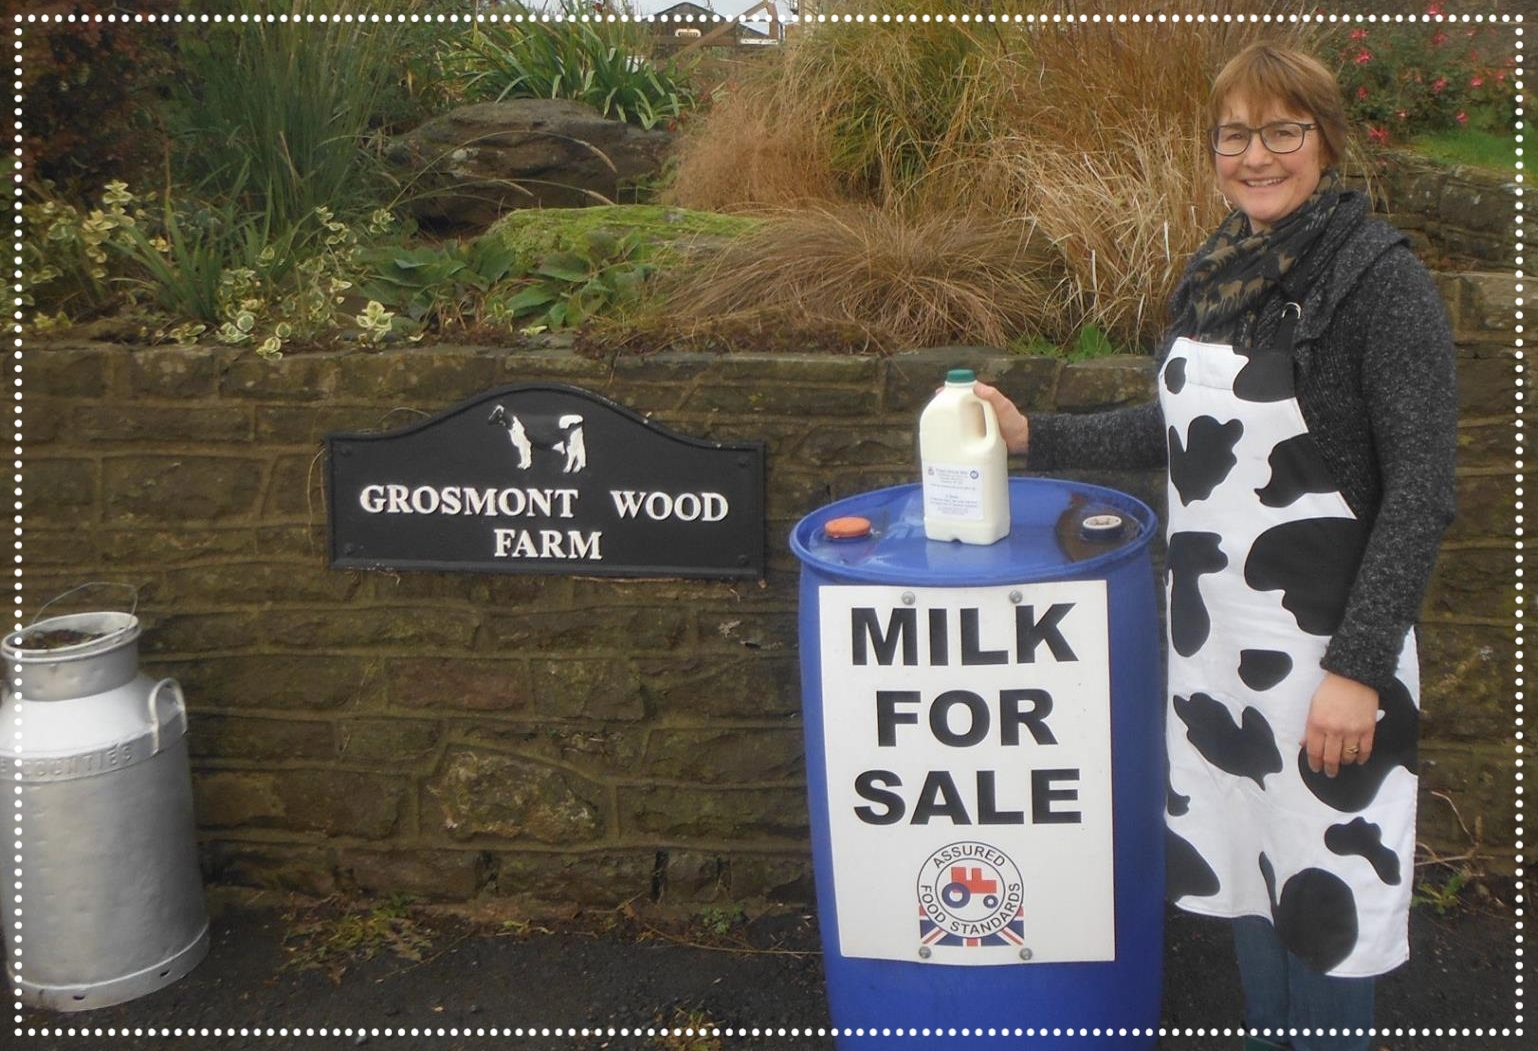 grosmont wood farm raw milk